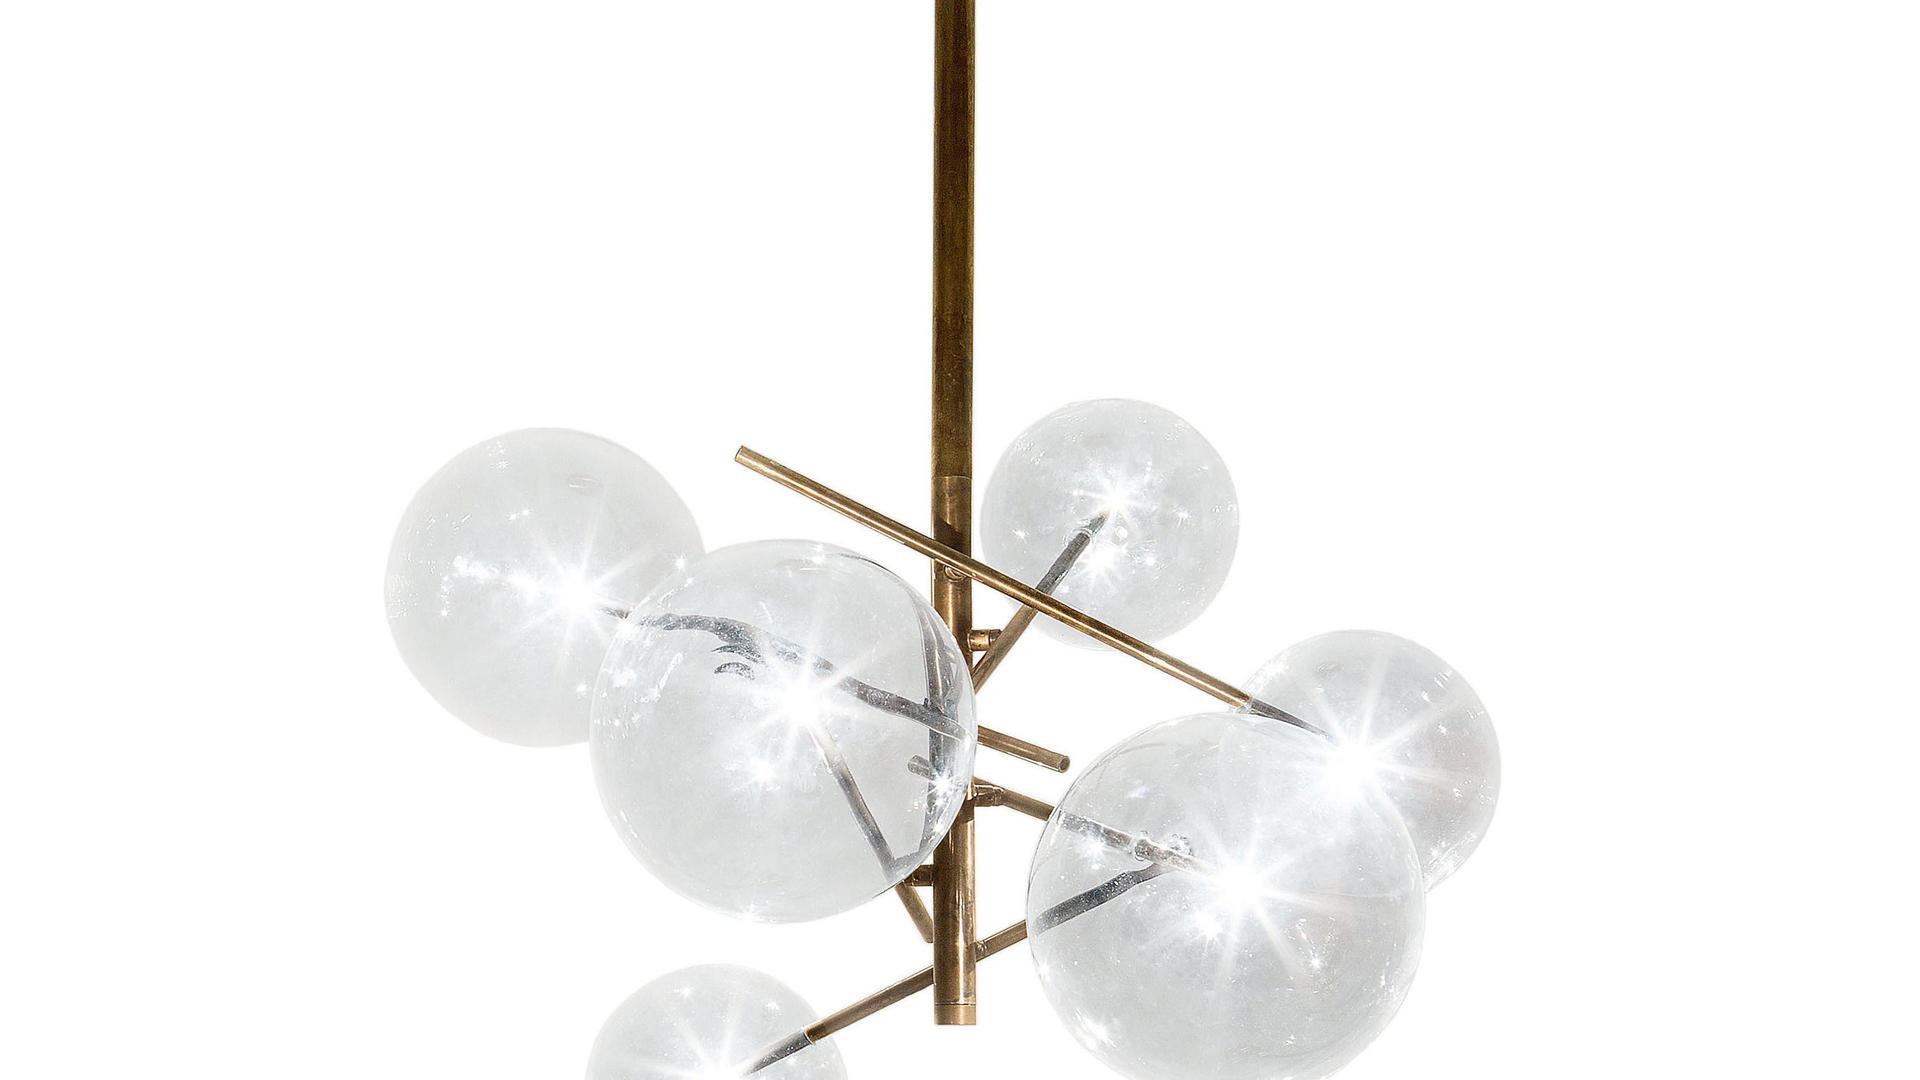 Bolle lamp.jpg